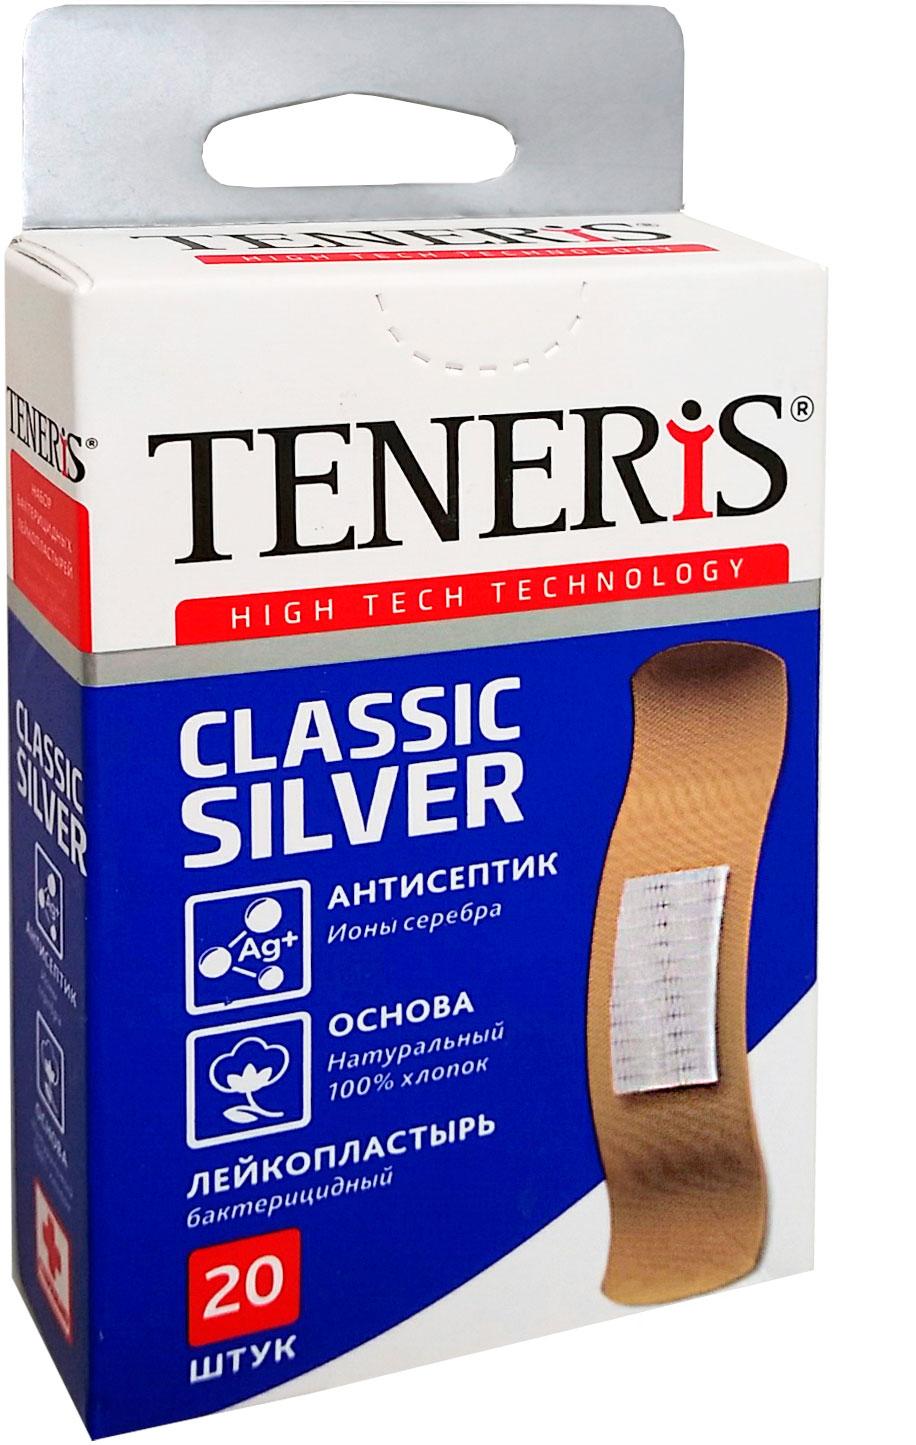 Набор лейкопластырей Тенерис Классик Силвер бактерицидных: 20 шт, 76 мм х19 мм